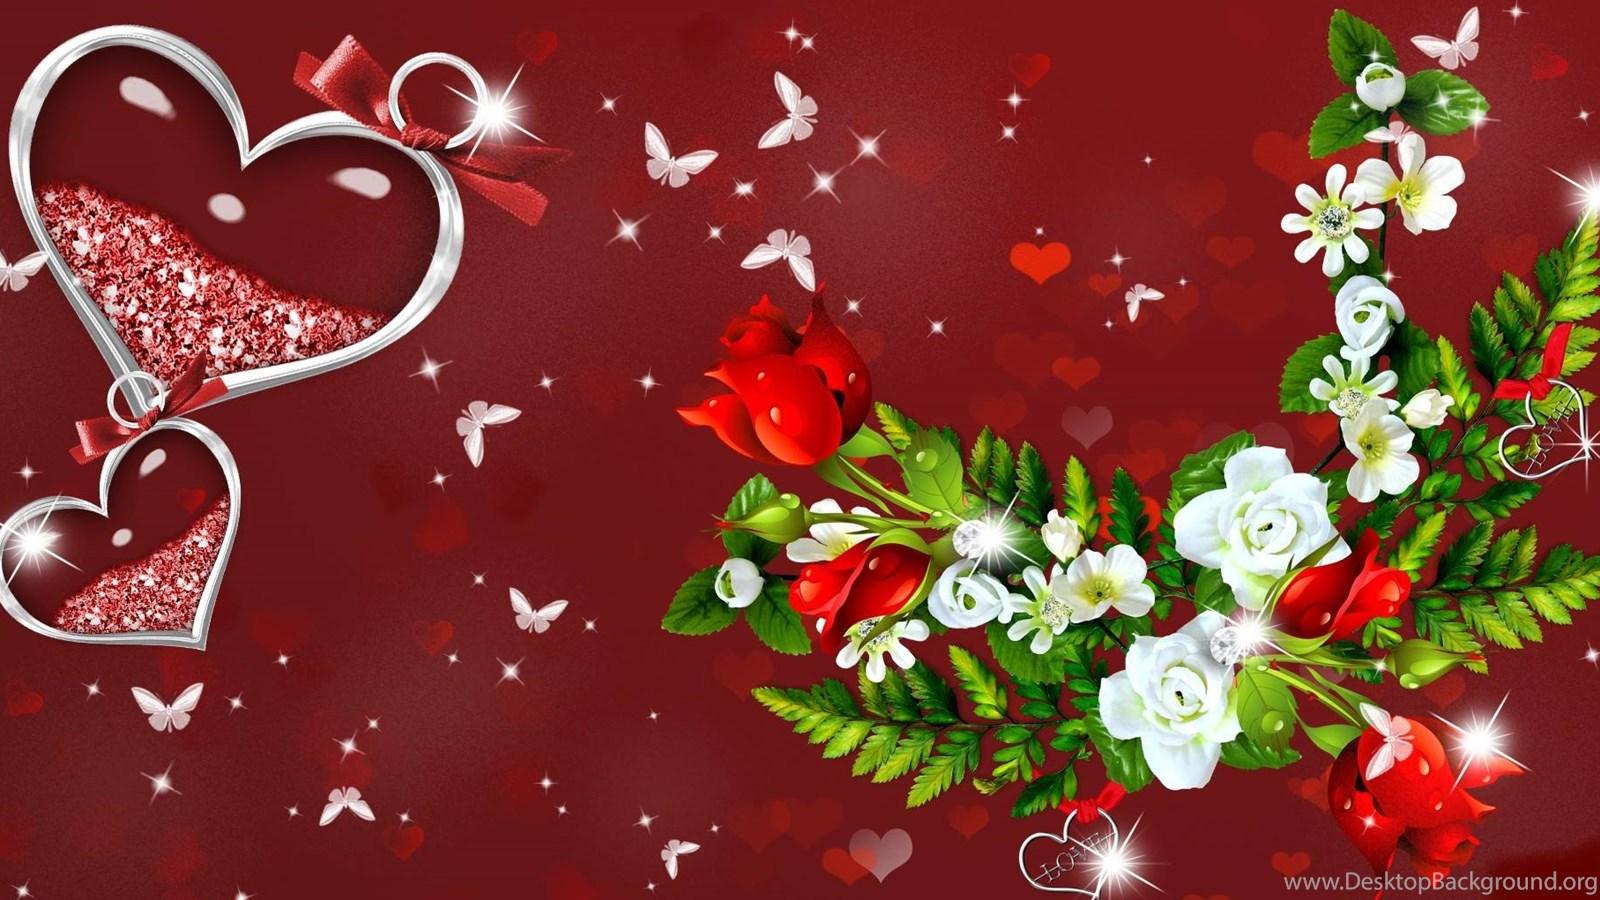 sweet love wallpapers for mobile desktop background